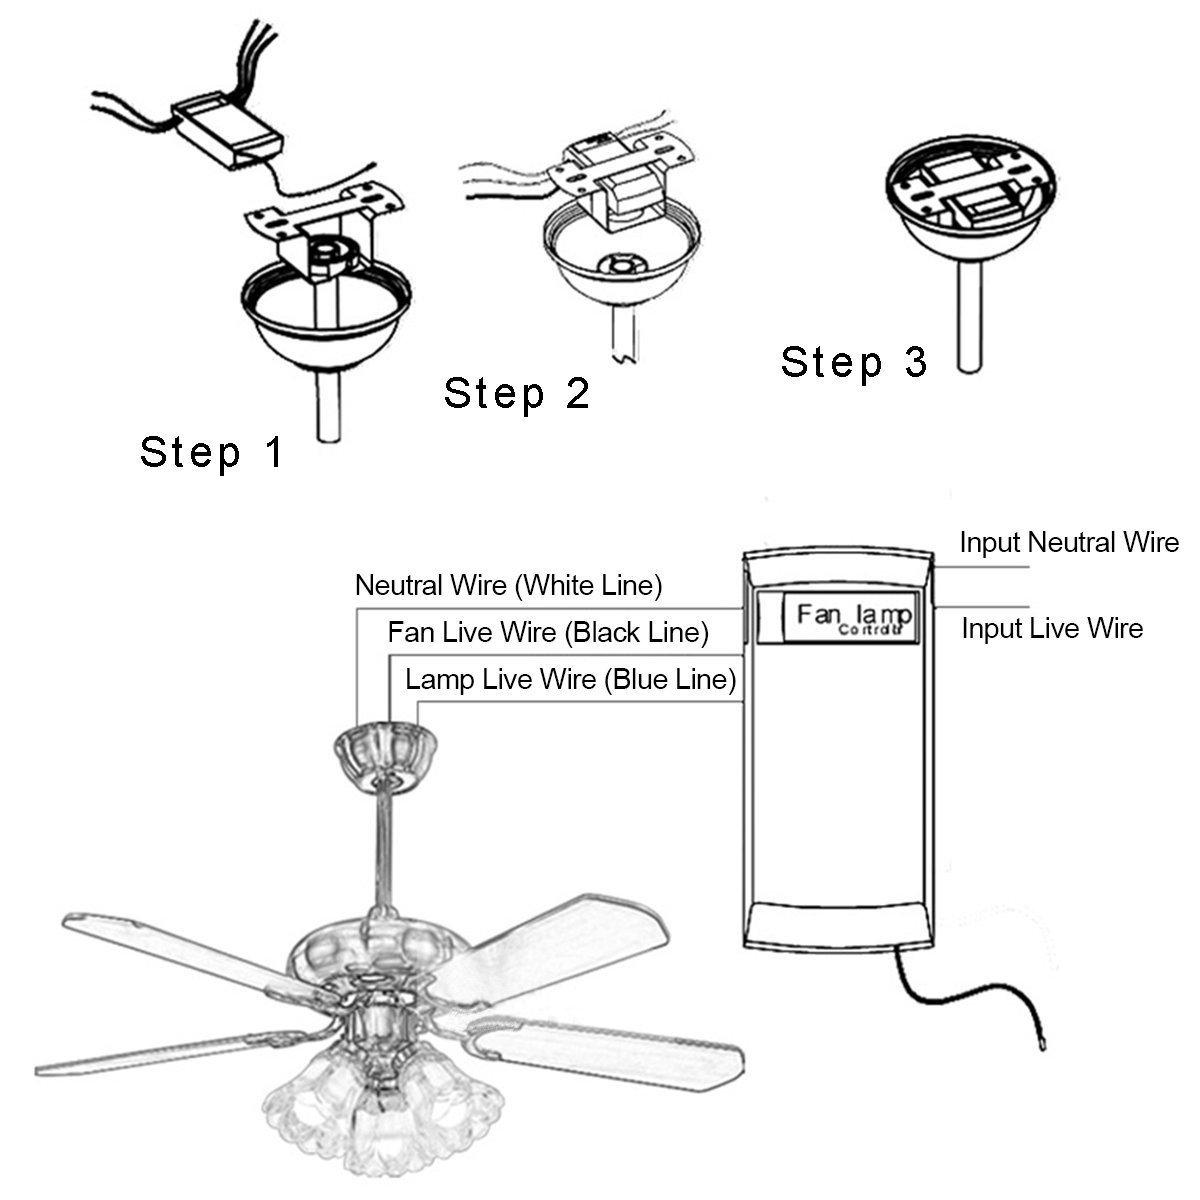 Ceiling Fan Remote Control Replacement For Hampton Bay Harbor Breeze Wiring Diagram Hunter Kujce9103 2aazpfan 53t 11t